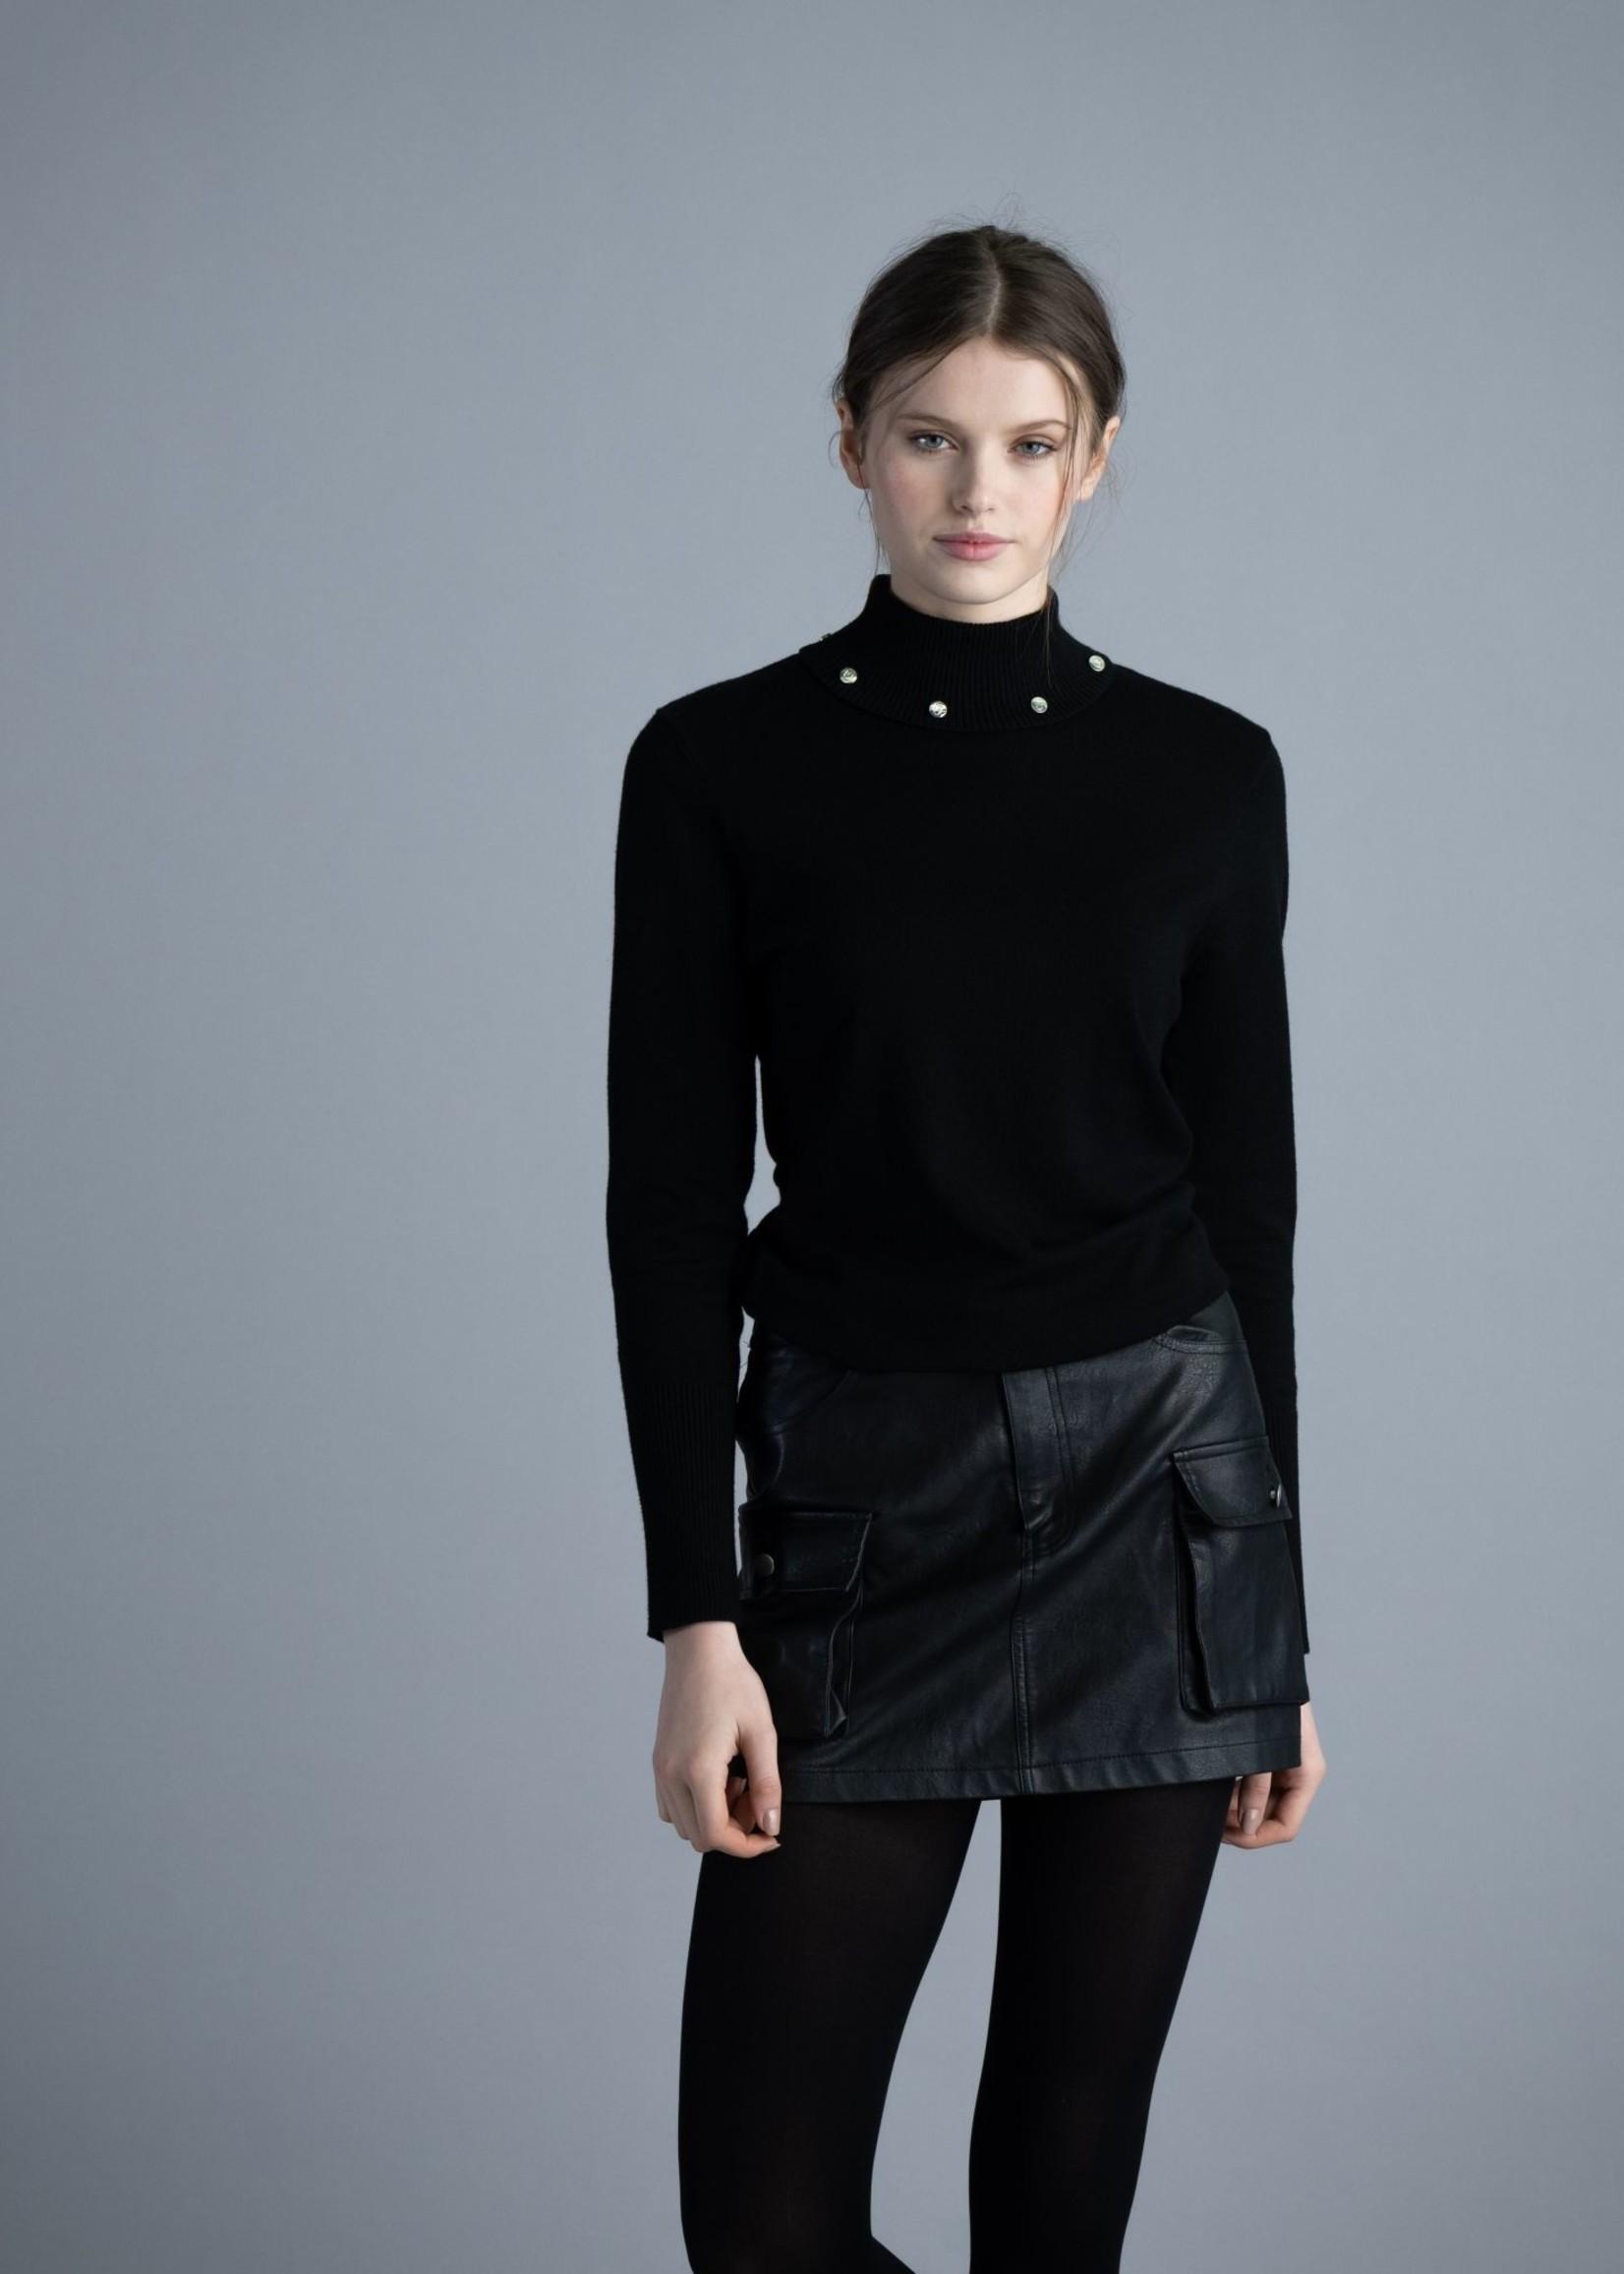 Marble Marble Turtleneck Sweater w/ Collar Details  Black